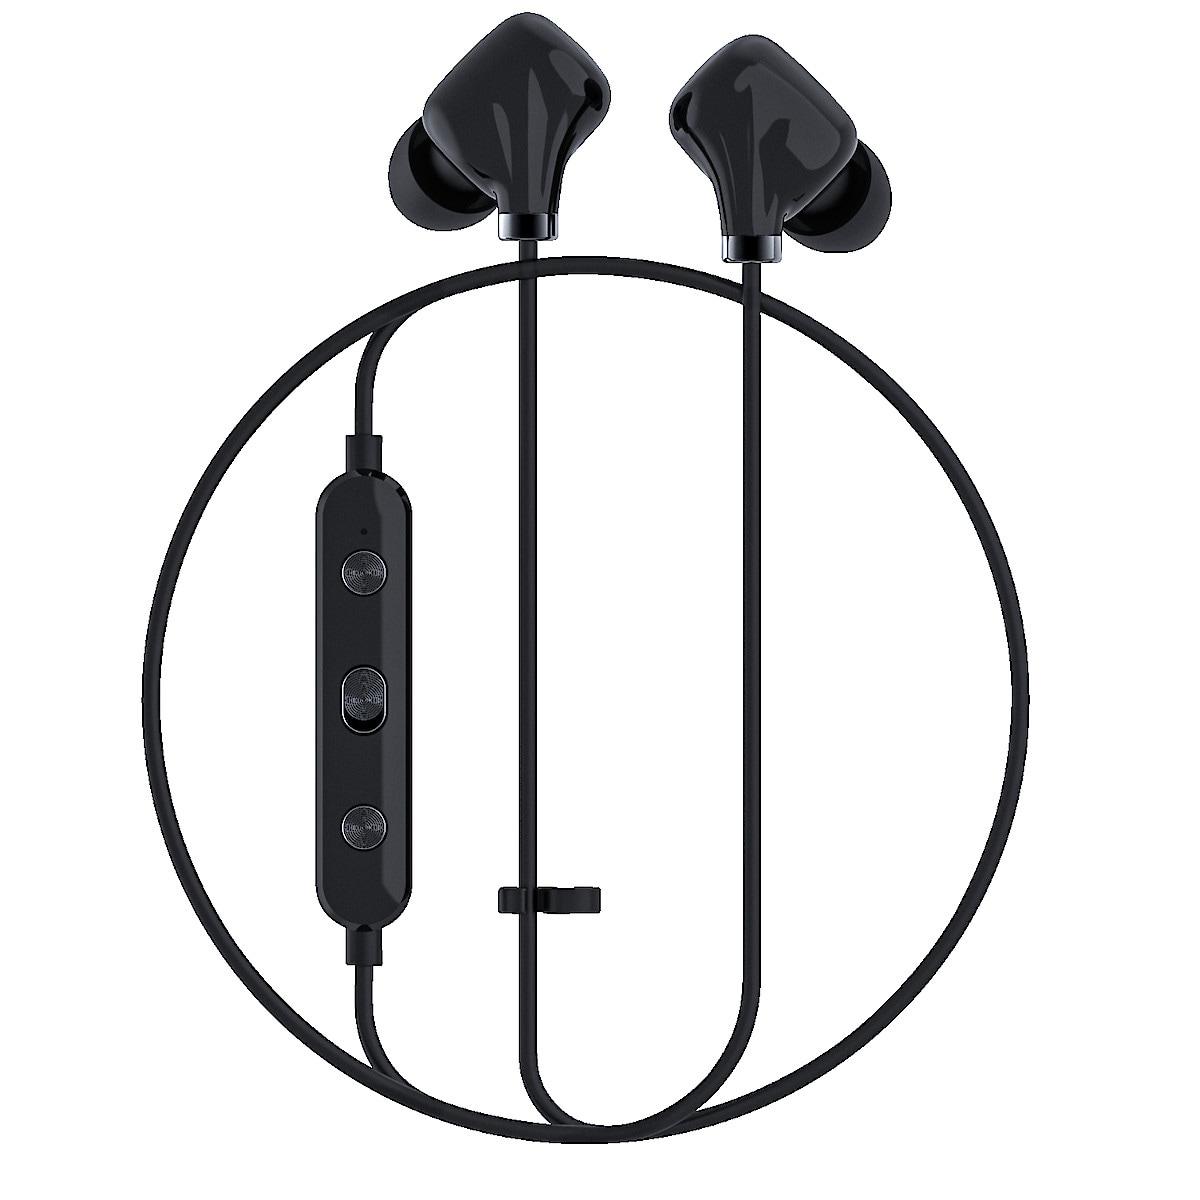 Happy Plugs Wireless Ear Piece II Headphones with Microphone